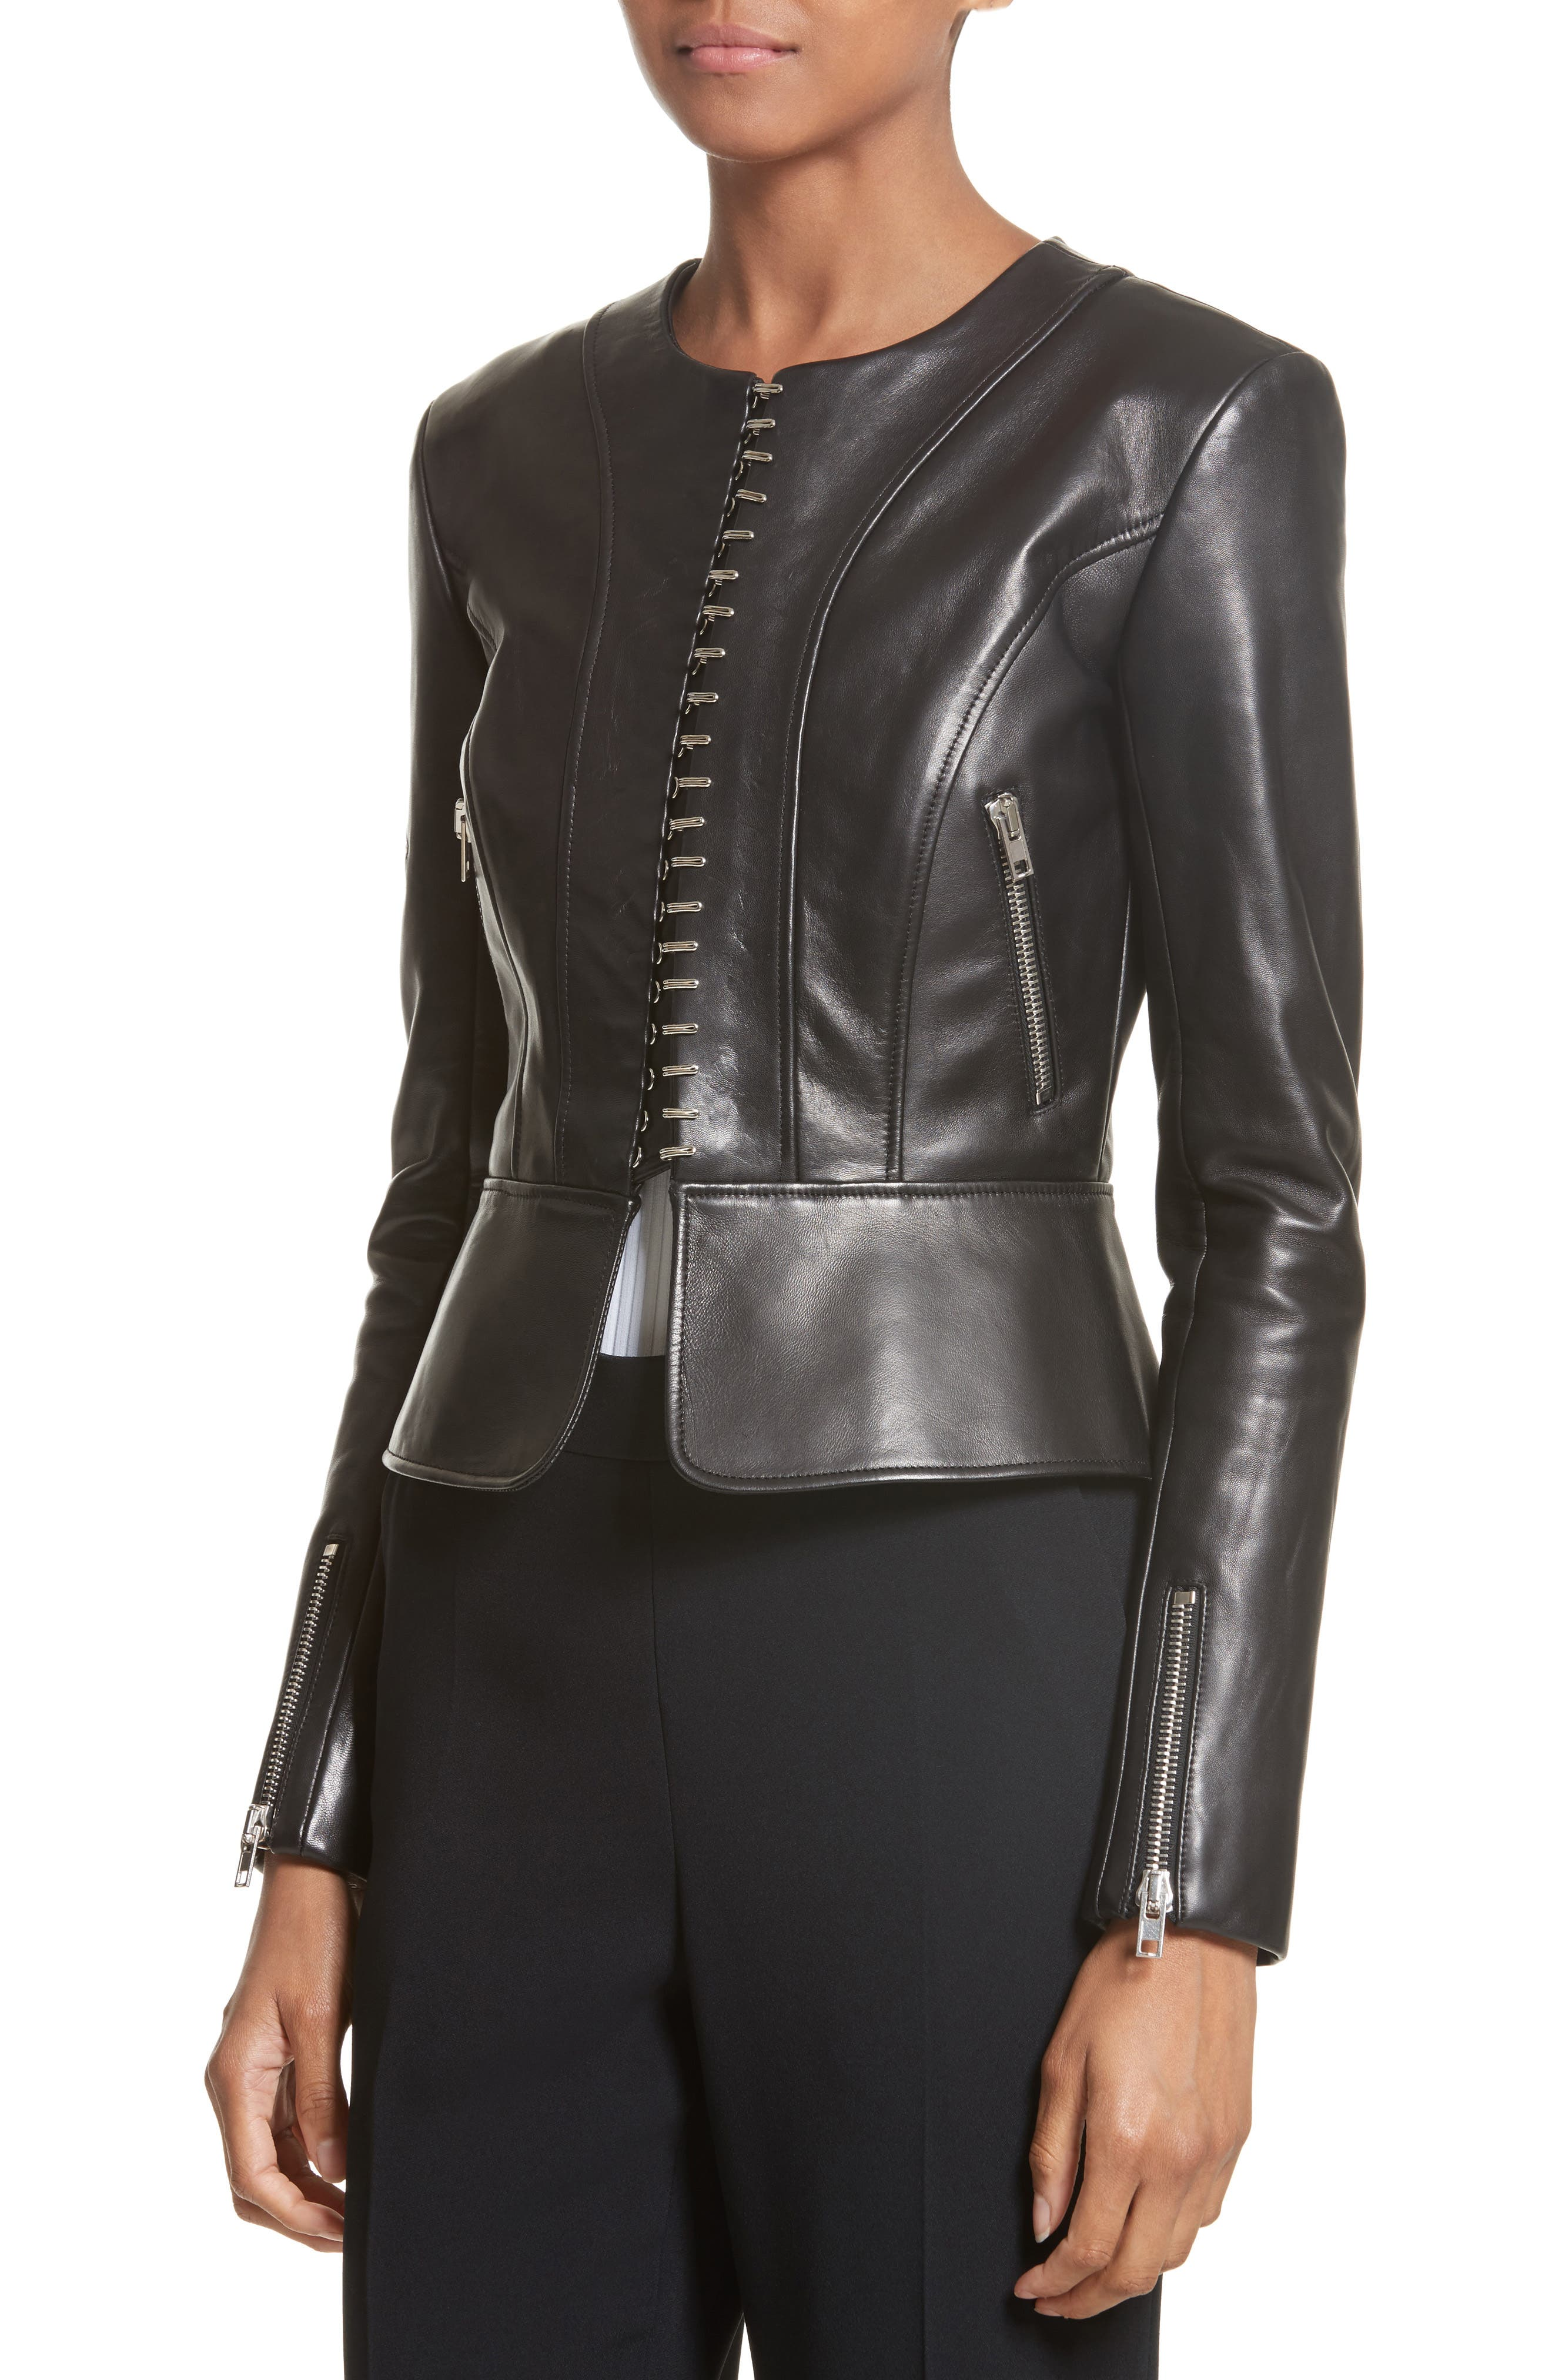 Hook Detail Lambskin Leather Jacket,                             Alternate thumbnail 4, color,                             001